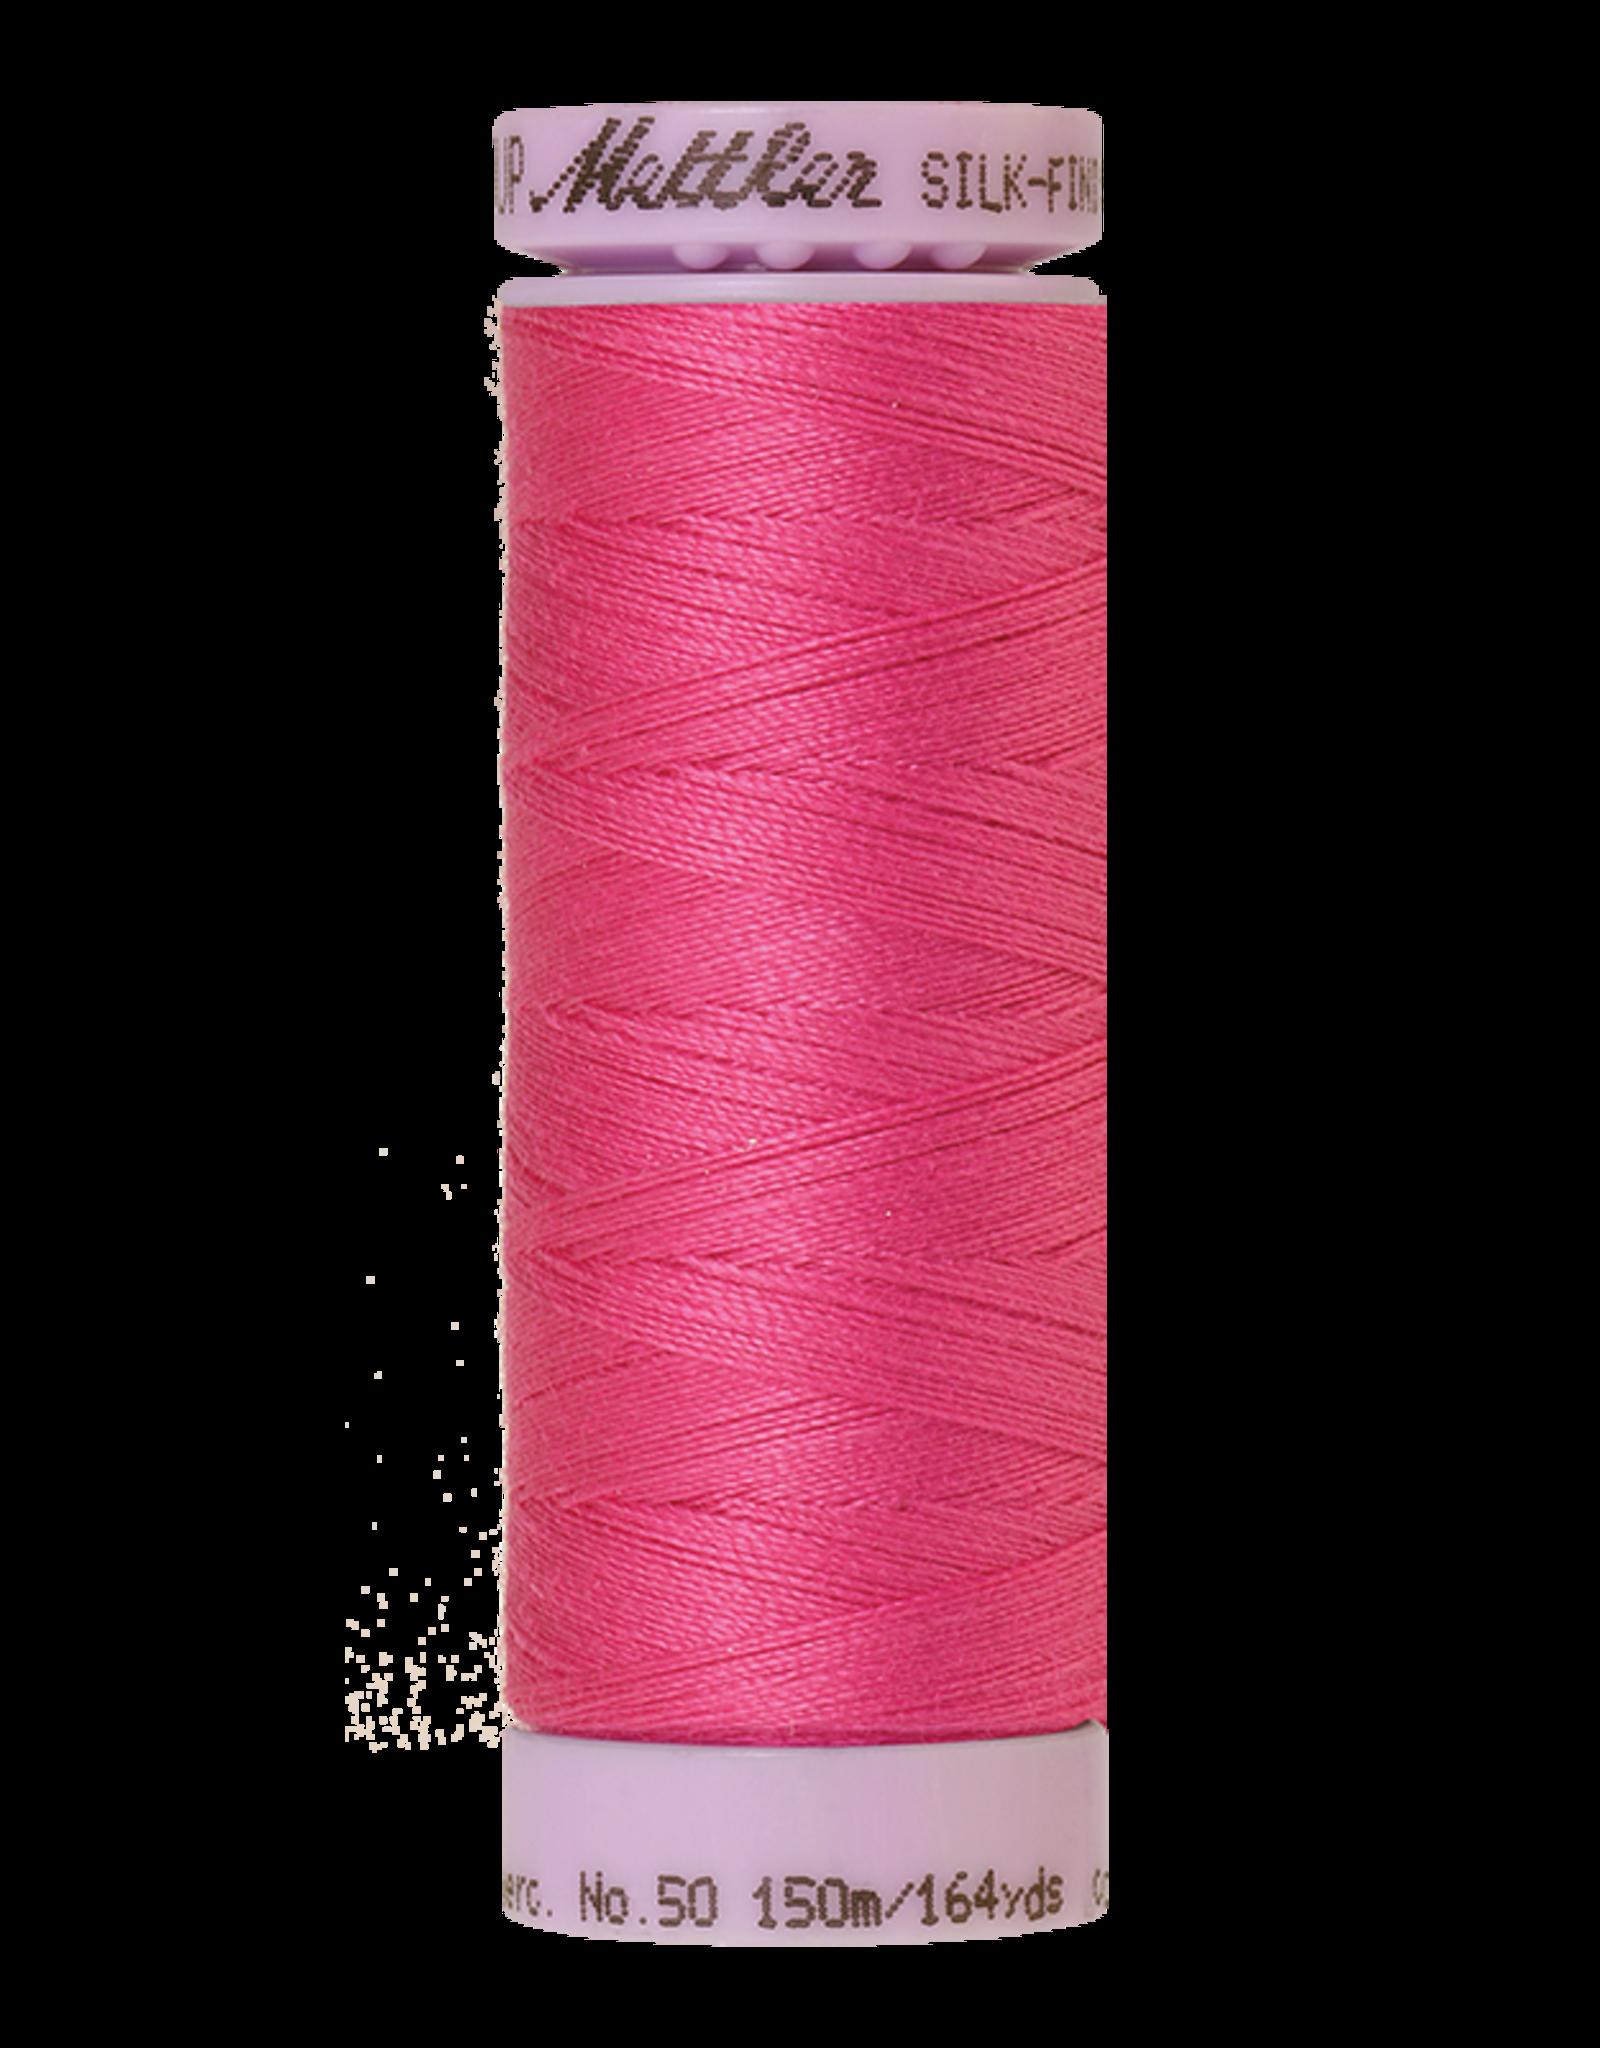 Mettler Silk Finish Cotton 50 - 150 meter - 1423